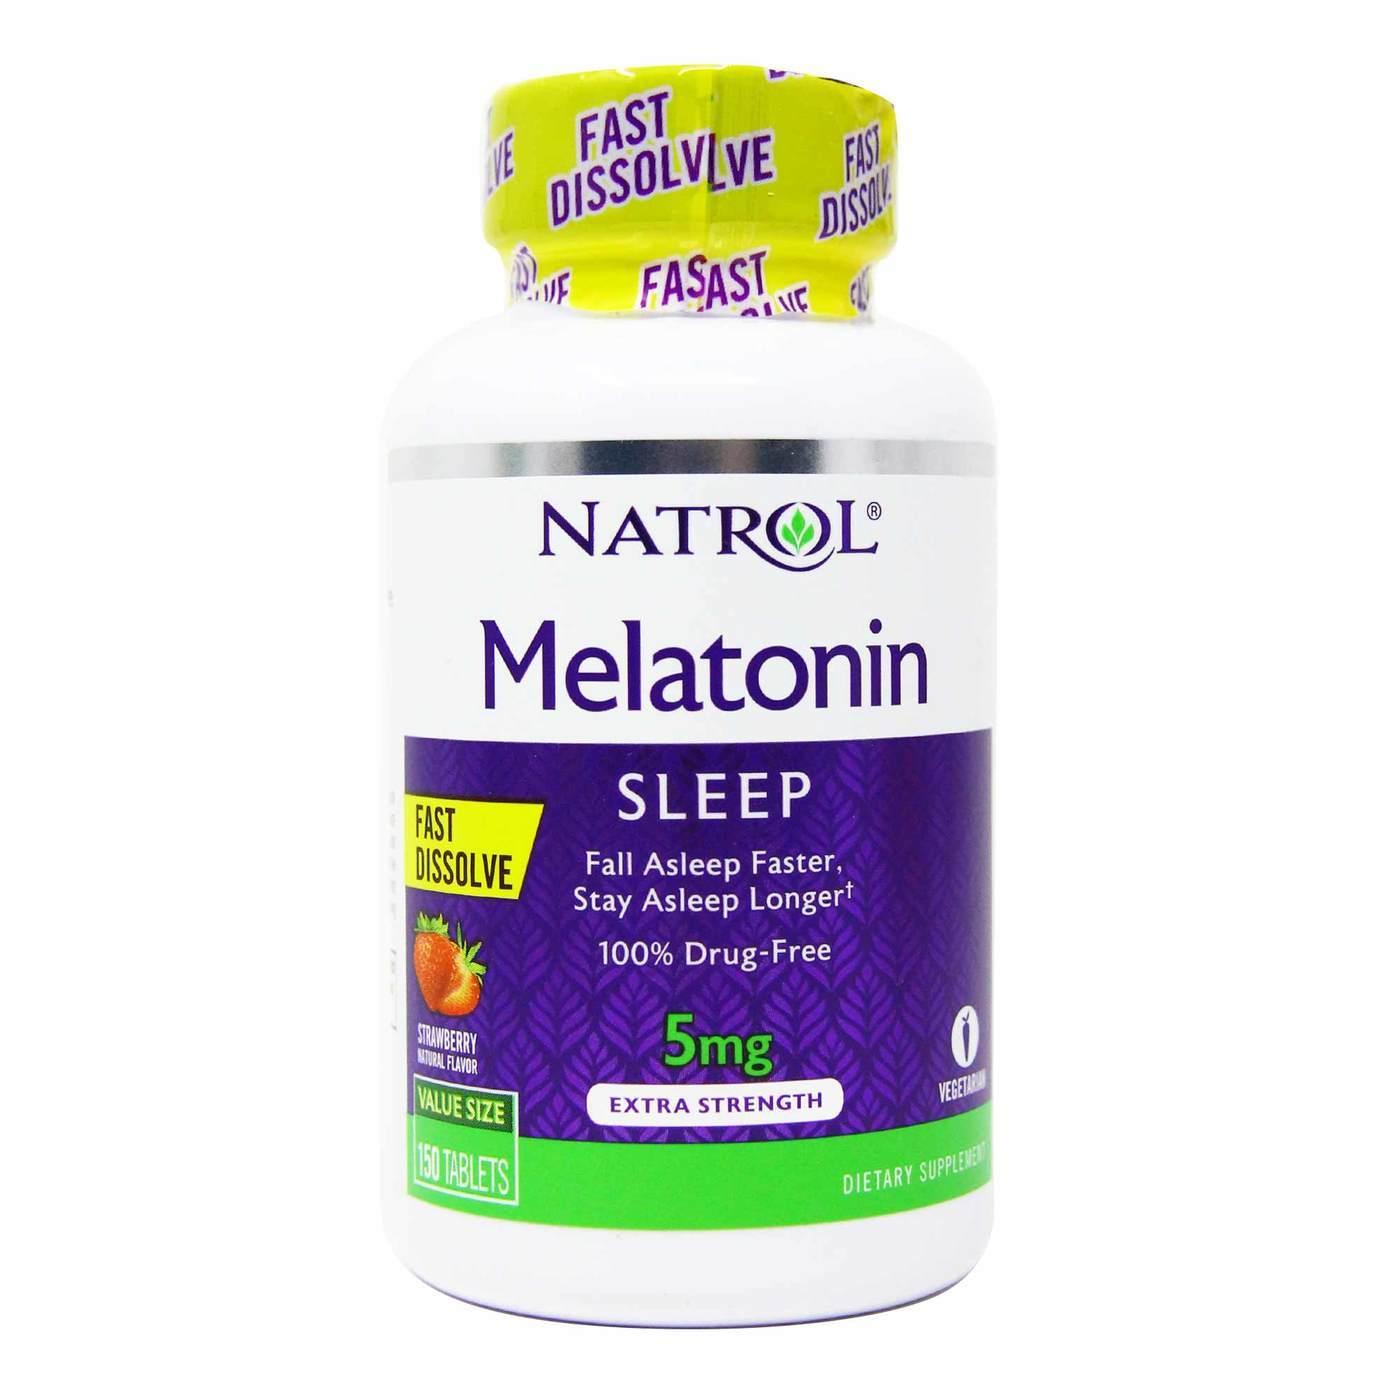 Melatonina   5 Mg   Dissolve na Boca   Natrol   150 Tbs